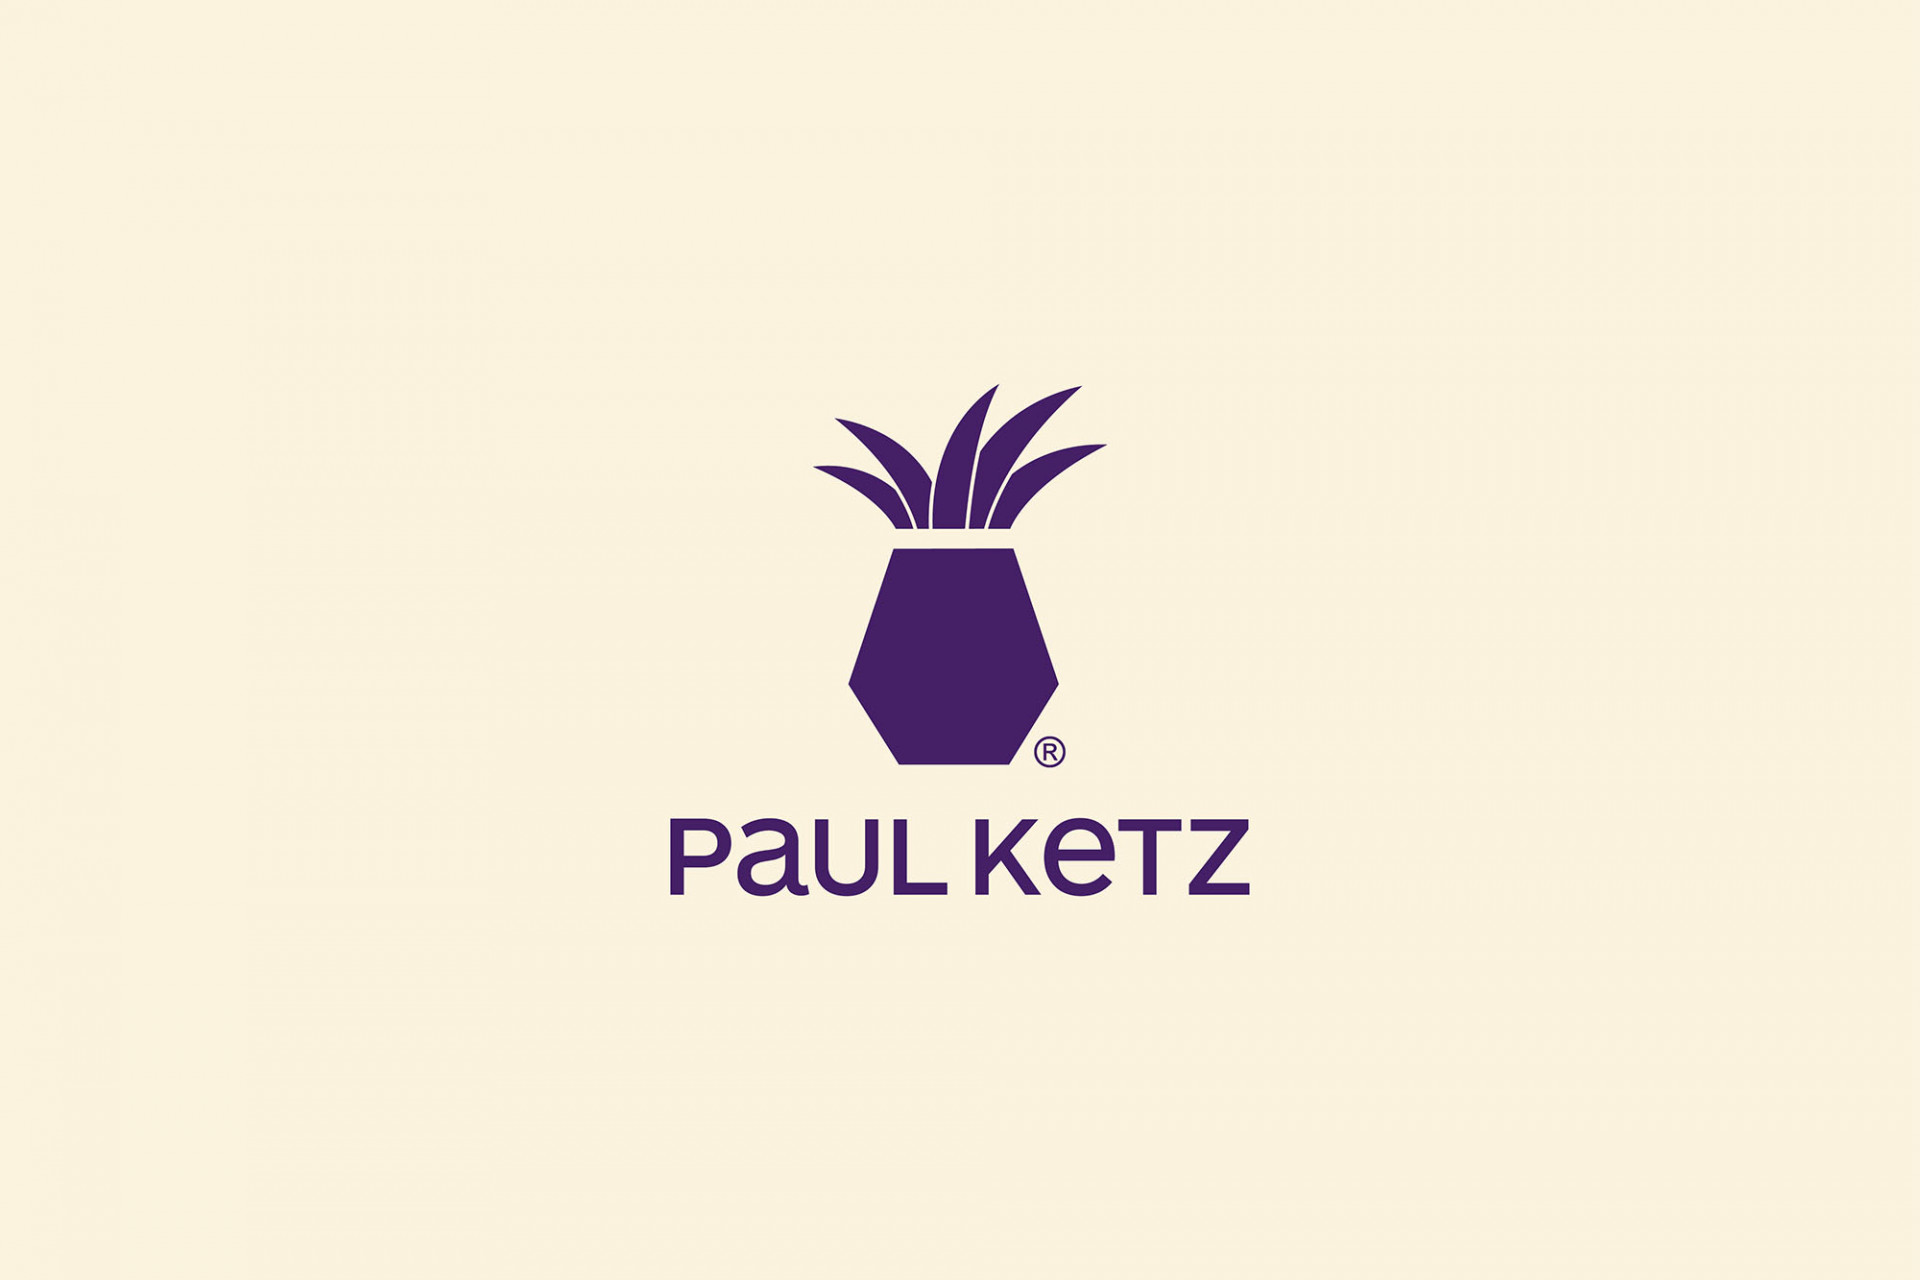 Büro Hyngar Visuelle Identität für Studio Paul Ketz